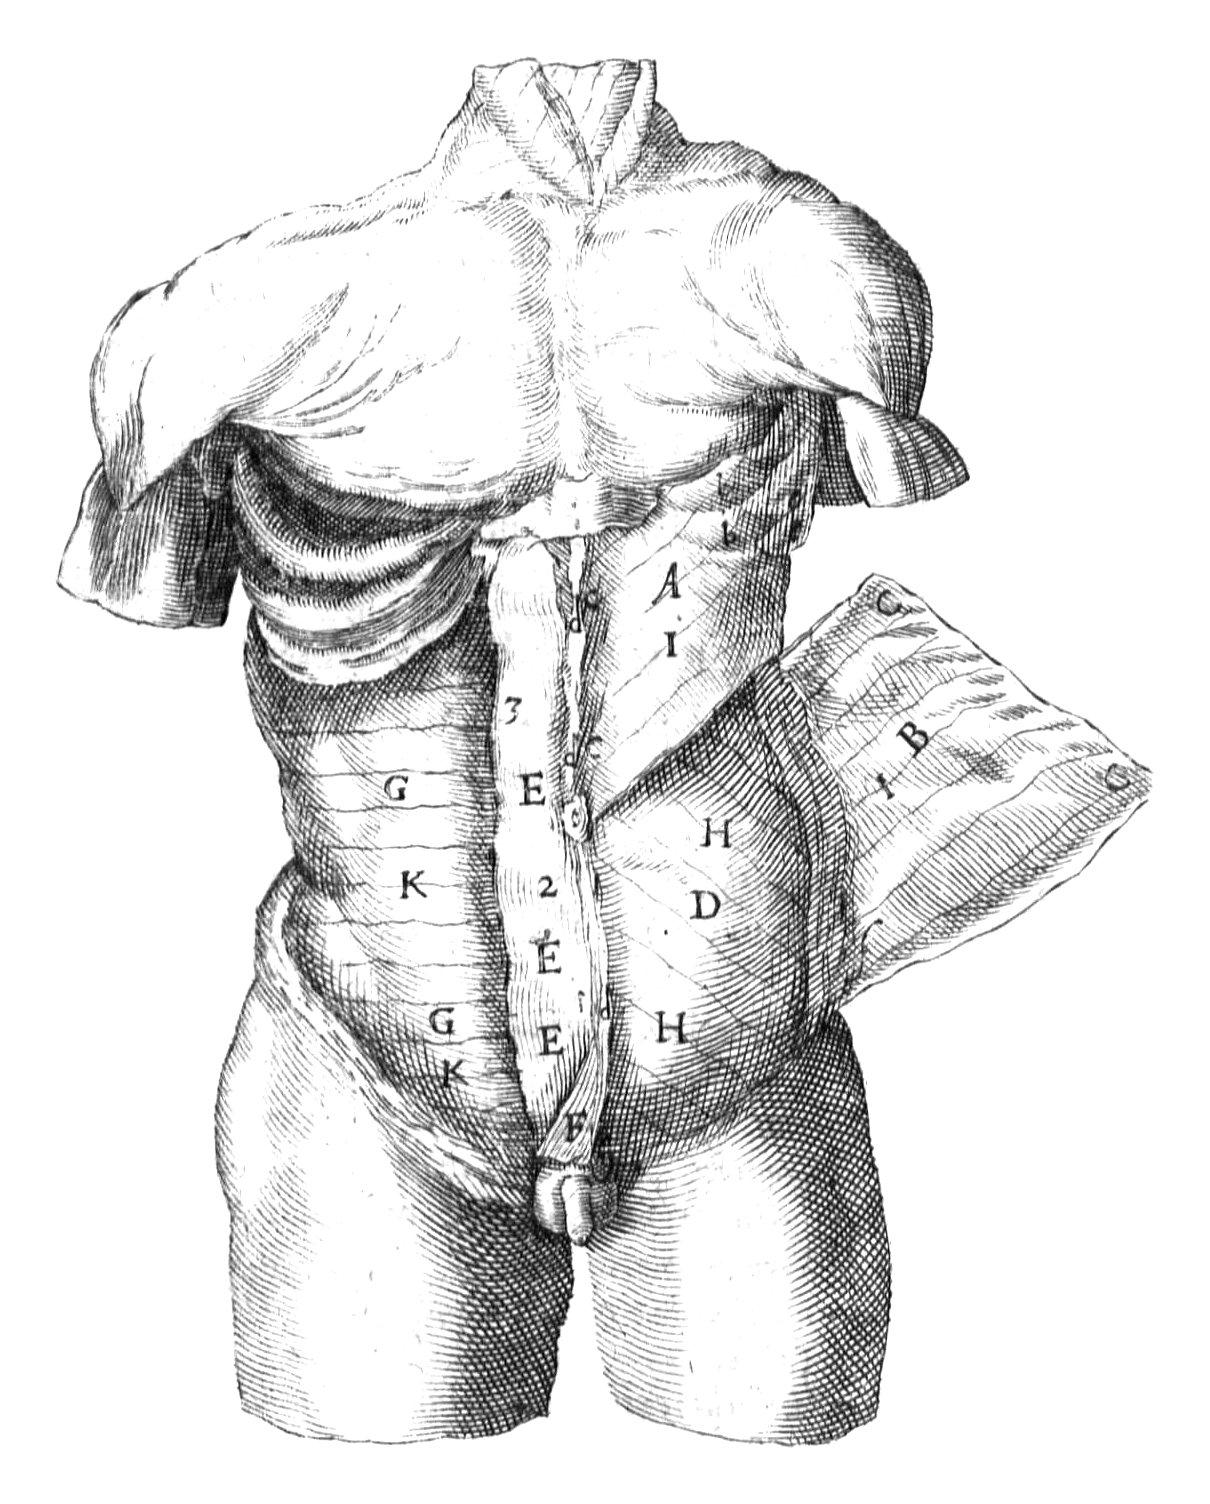 Datei:Fotothek df tg 0006551 Biologie ^ Anatomie ^ Mensch cropped ...